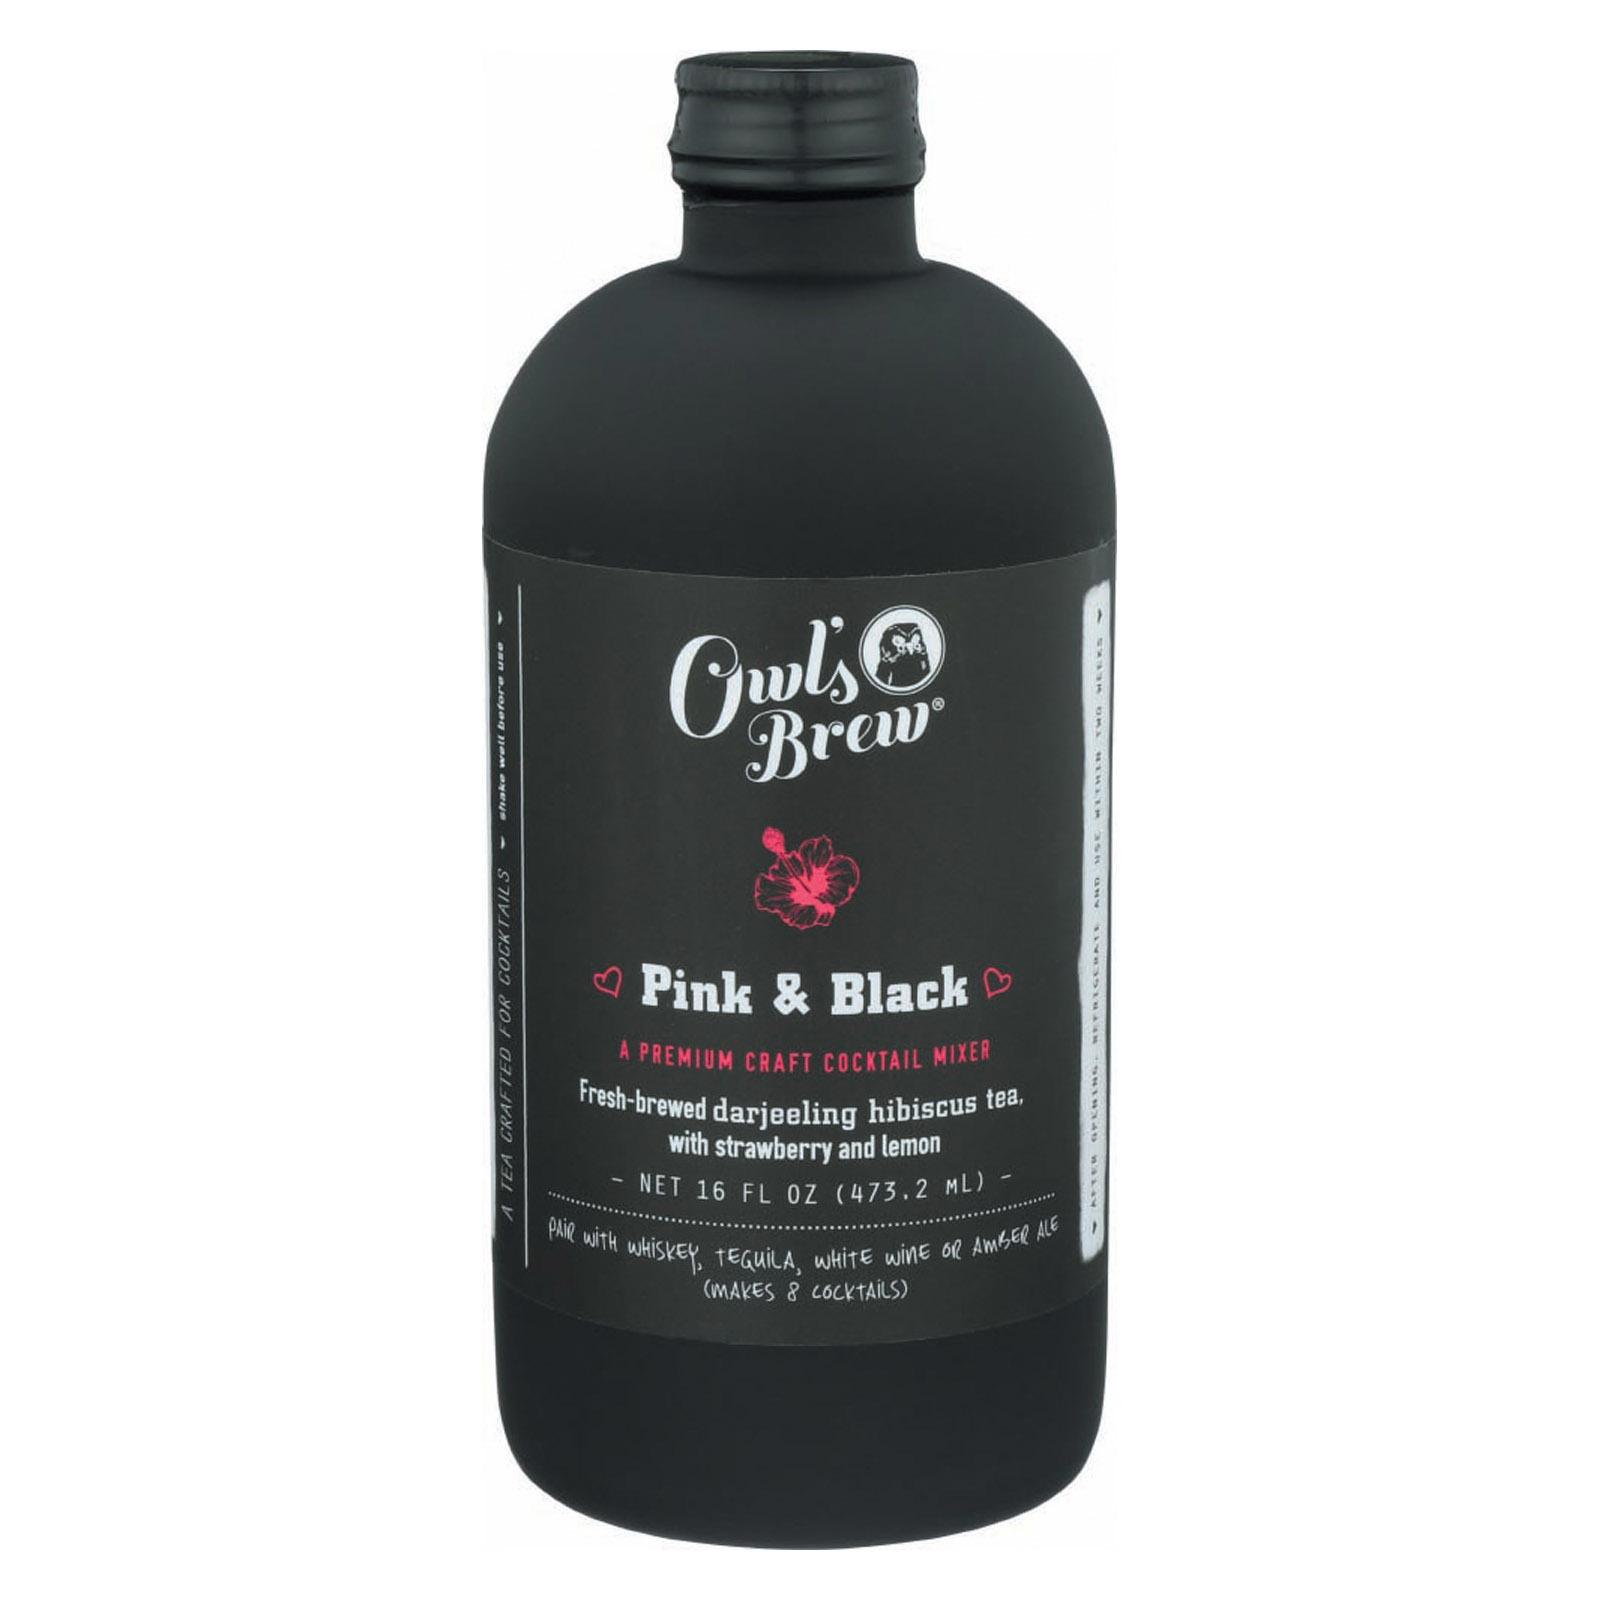 Owl's Brew Cktl Mixr - Pink & Black - Case of 6 - 16 fl oz